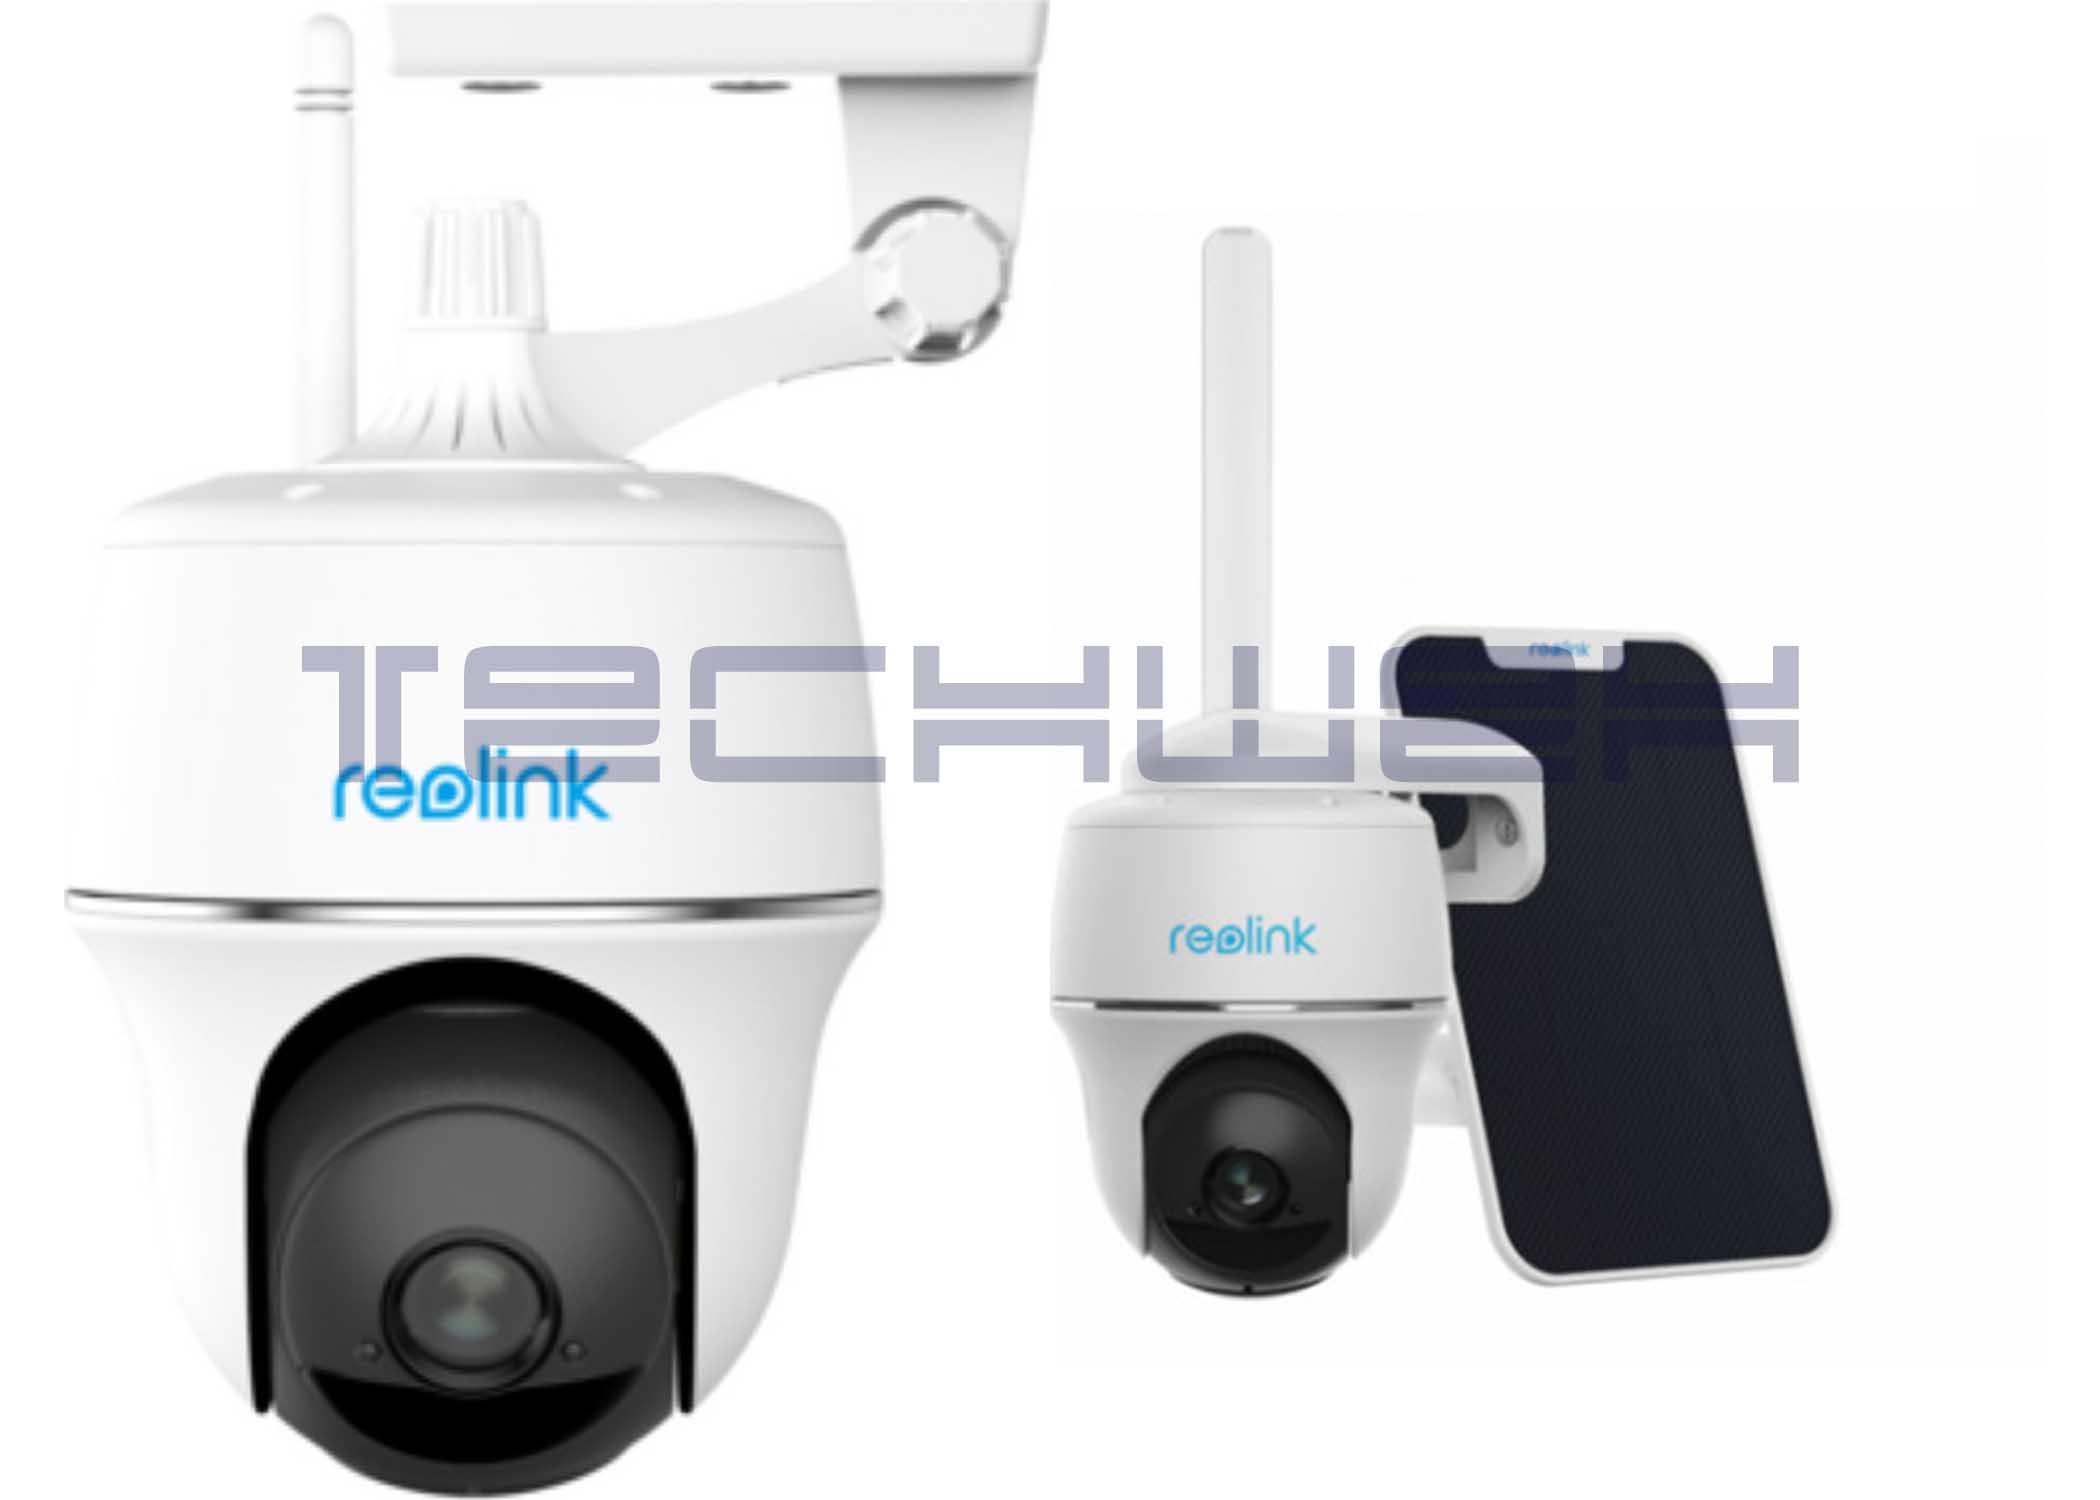 7 Insane Build up of Reolink Argus PT Wireless Pan-Tilt Battery Security Camera